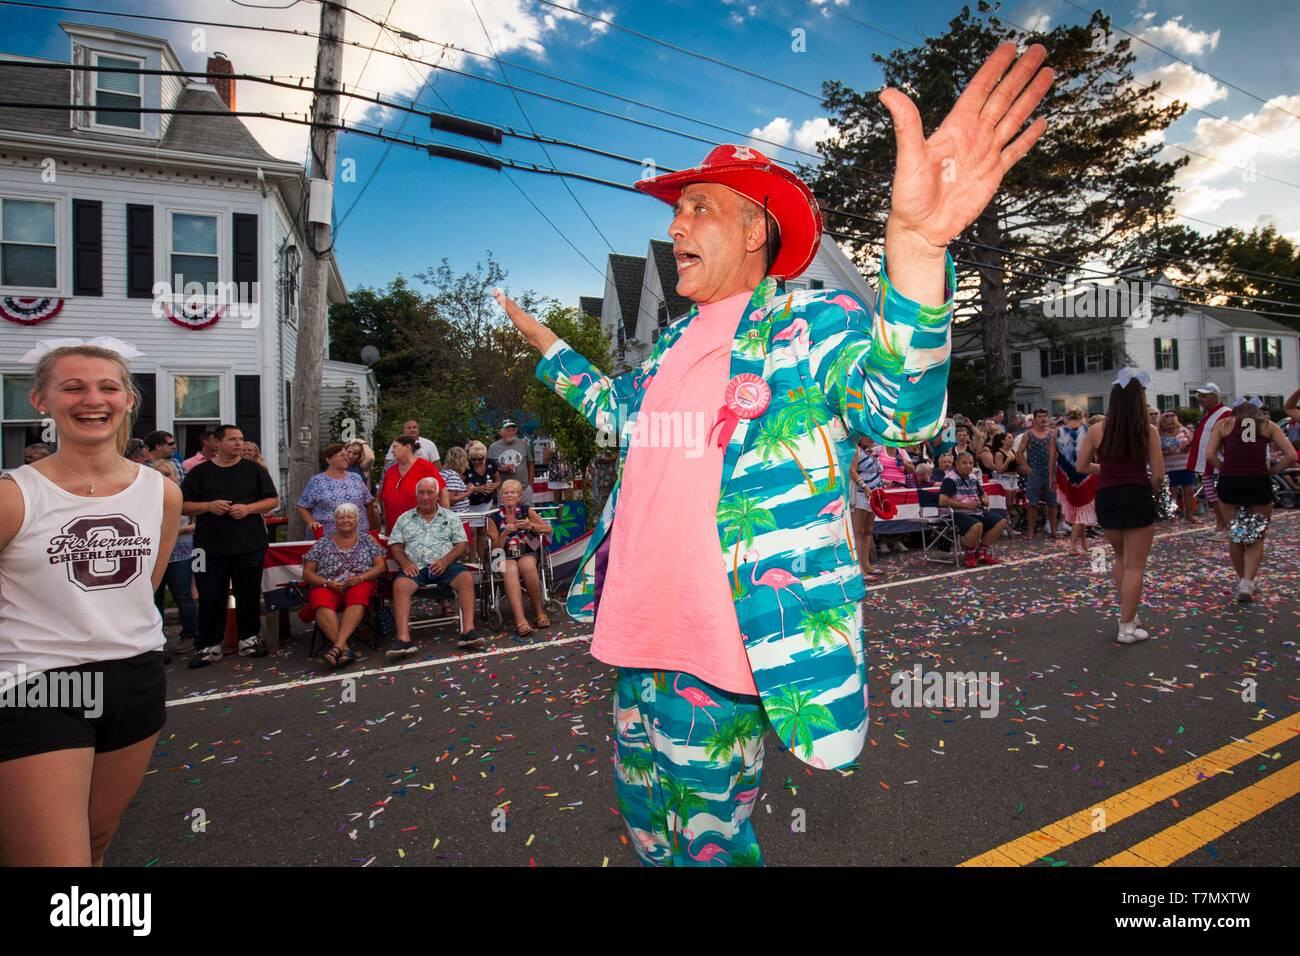 Horribles Parade Stock Photos & Horribles Parade Stock